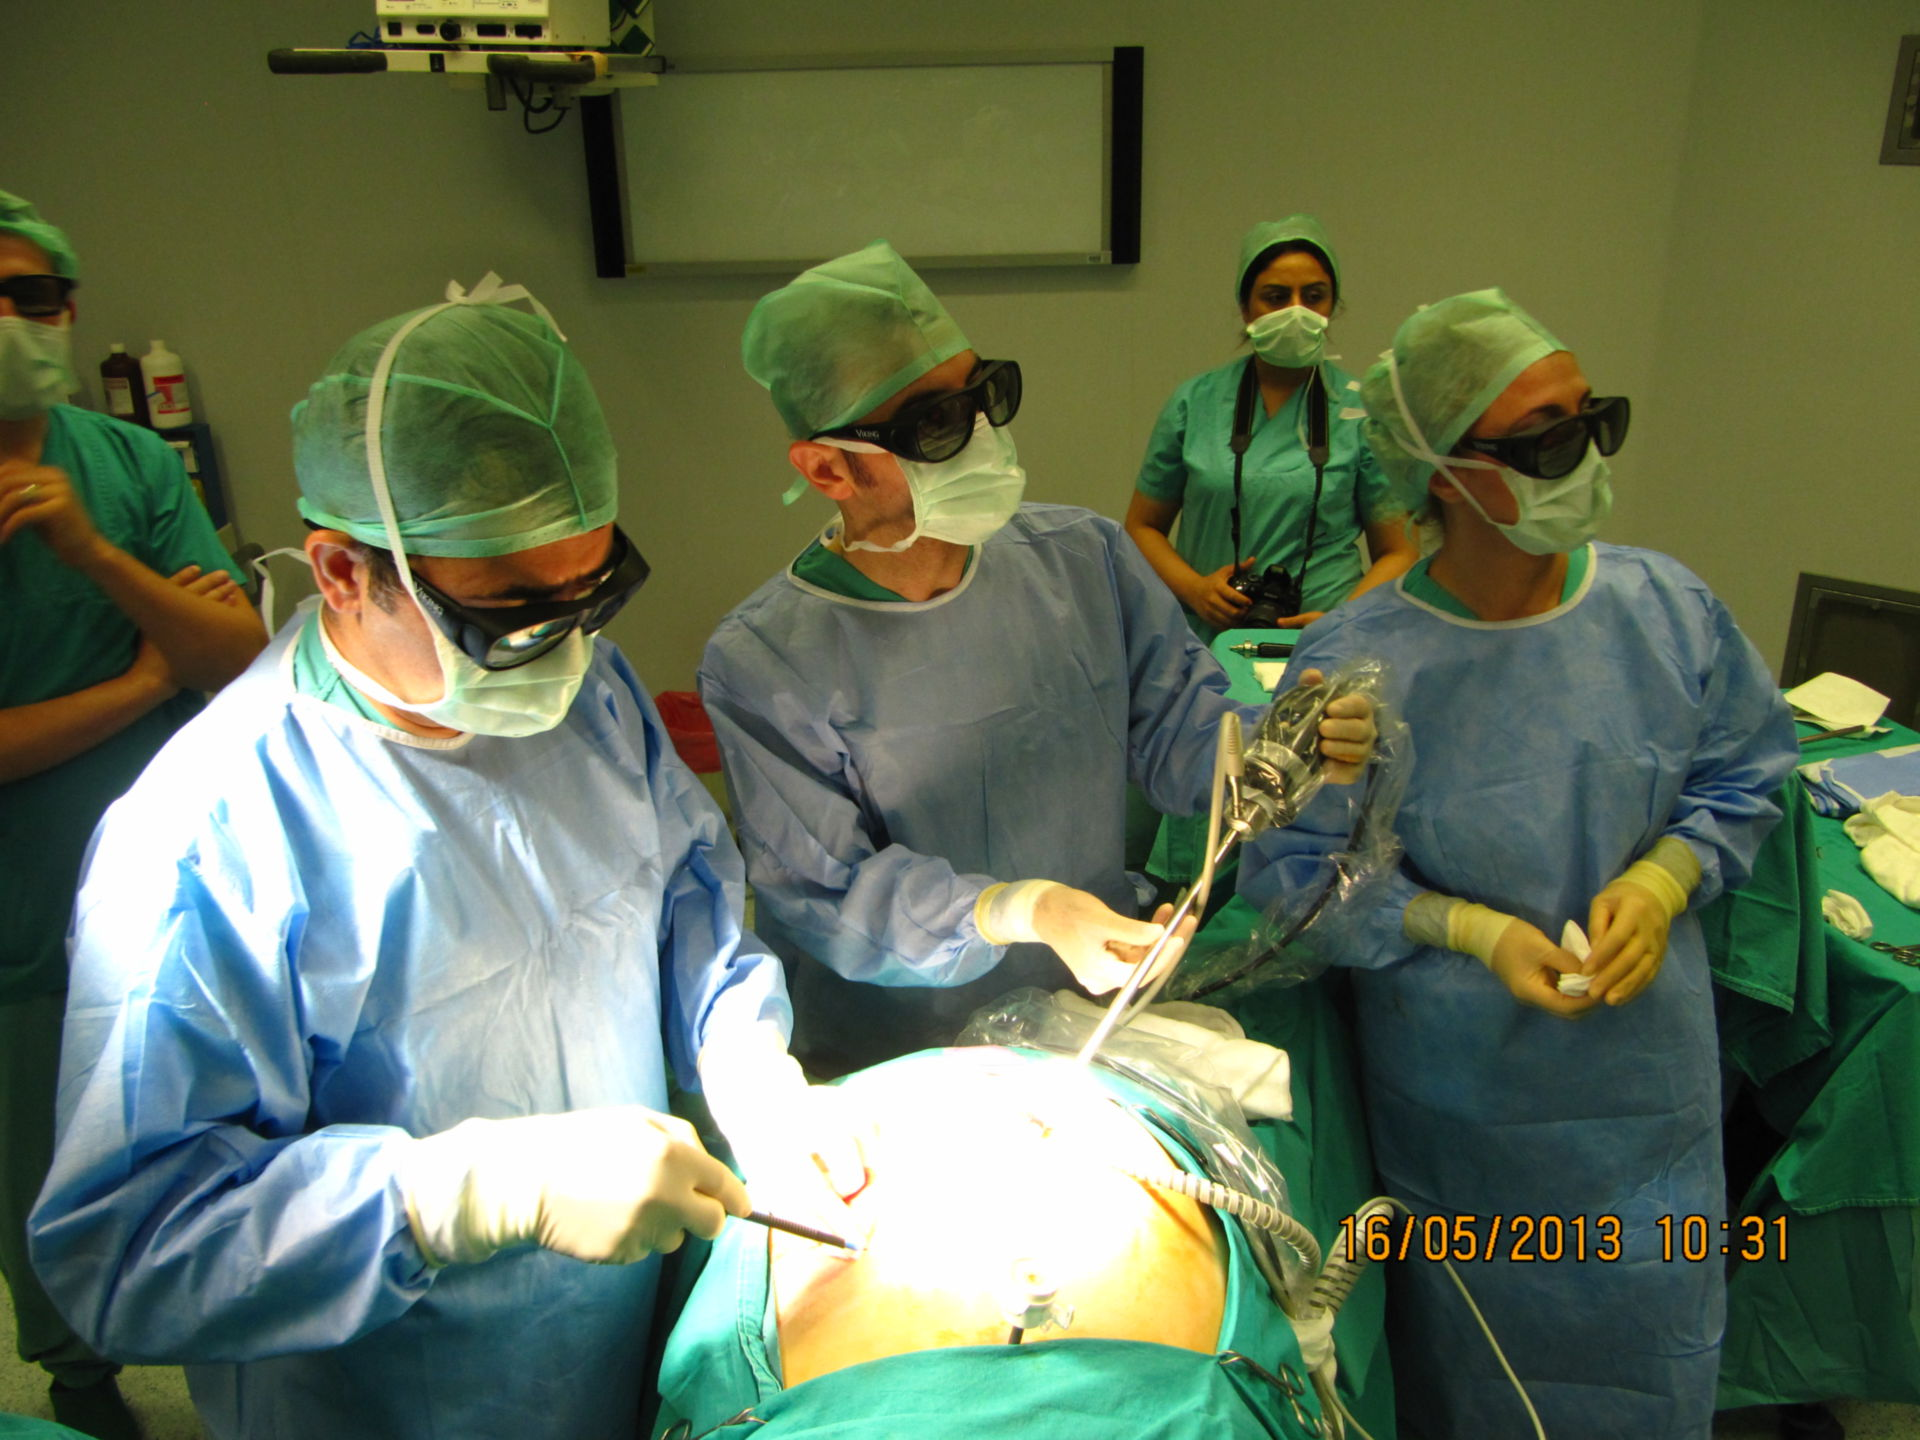 3D - Laparoskopische Sleeve-Gastrektomie